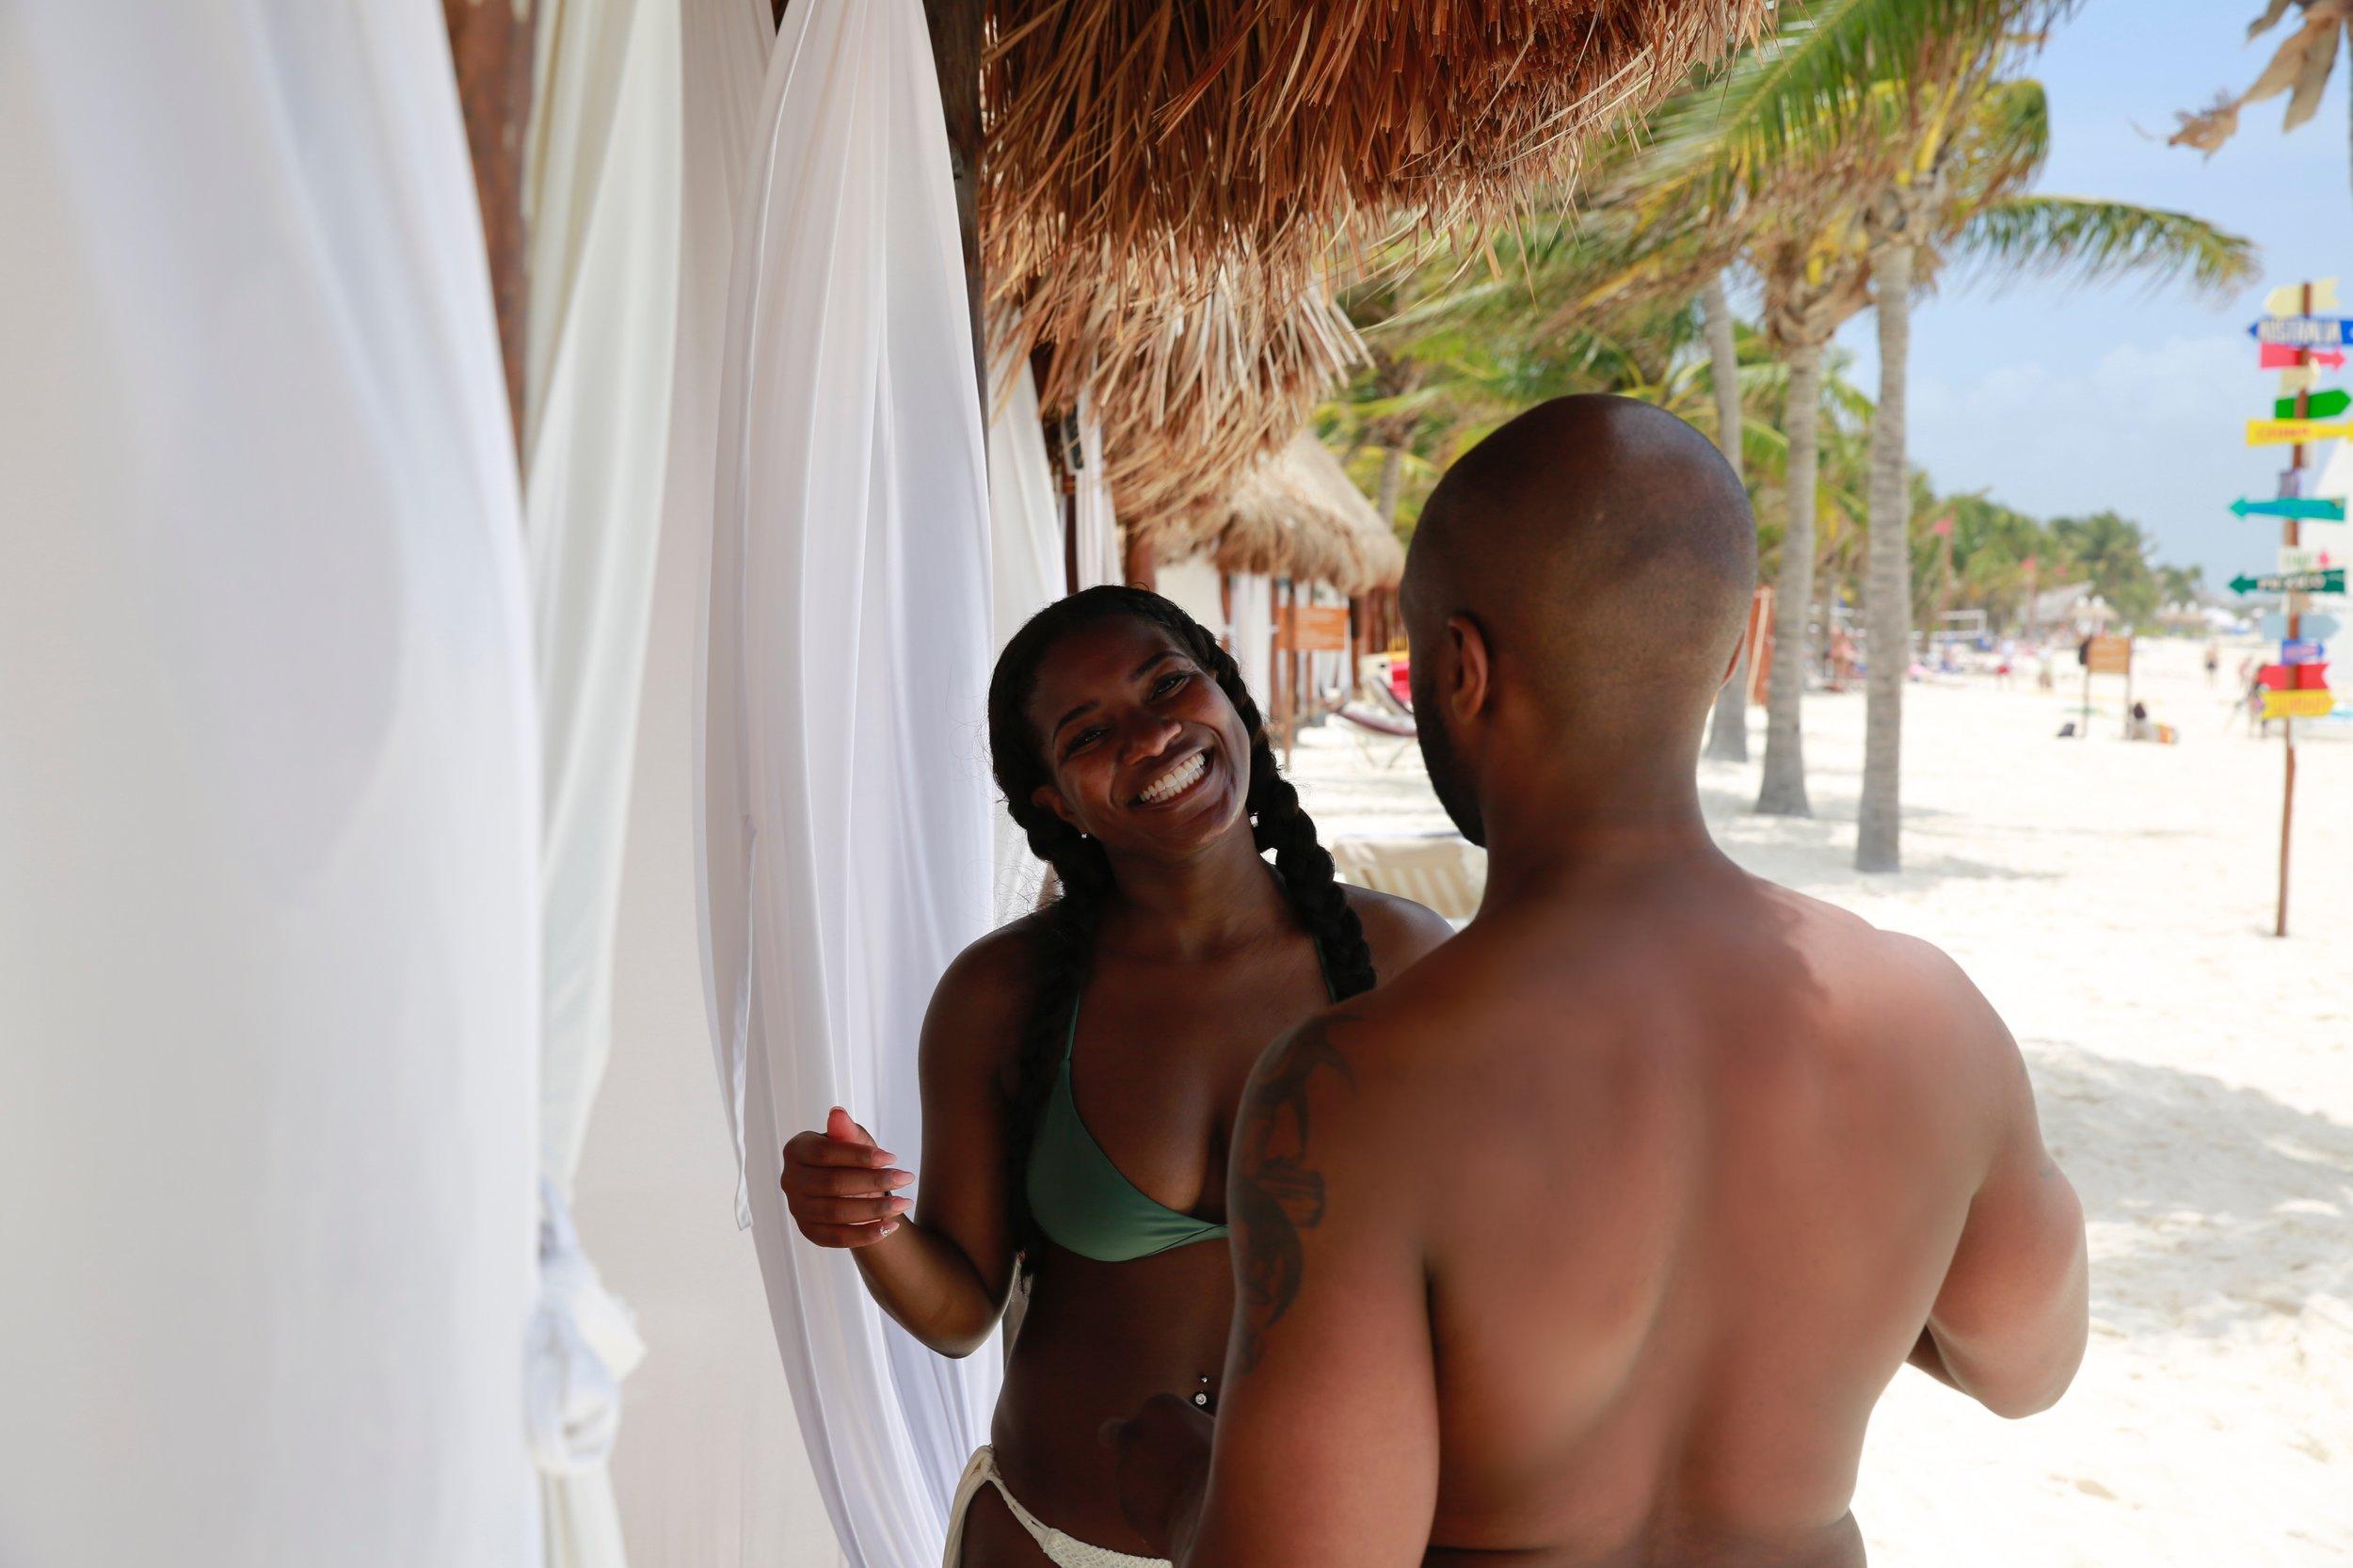 Black Destination Bride - BlackDesti Wedding Countdown Journal - Bridefriends Podcast - 1 Playa del Carmen Mexico - Secrets Maroma beach cabana talking.JPG